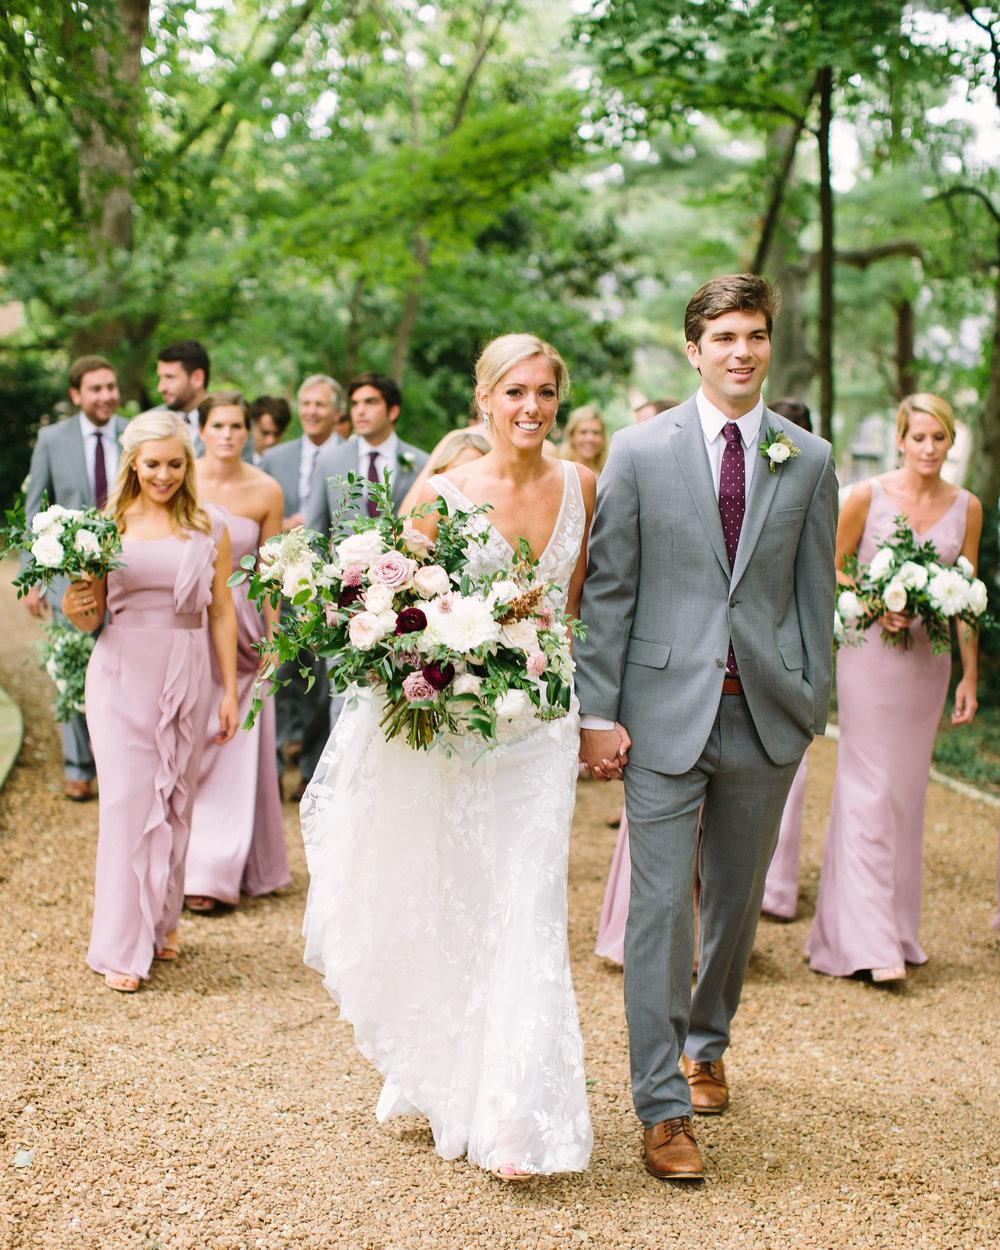 Dusty rose, blush, and ivory bridal bouquet with lush greenery // Nashville Wedding Florist